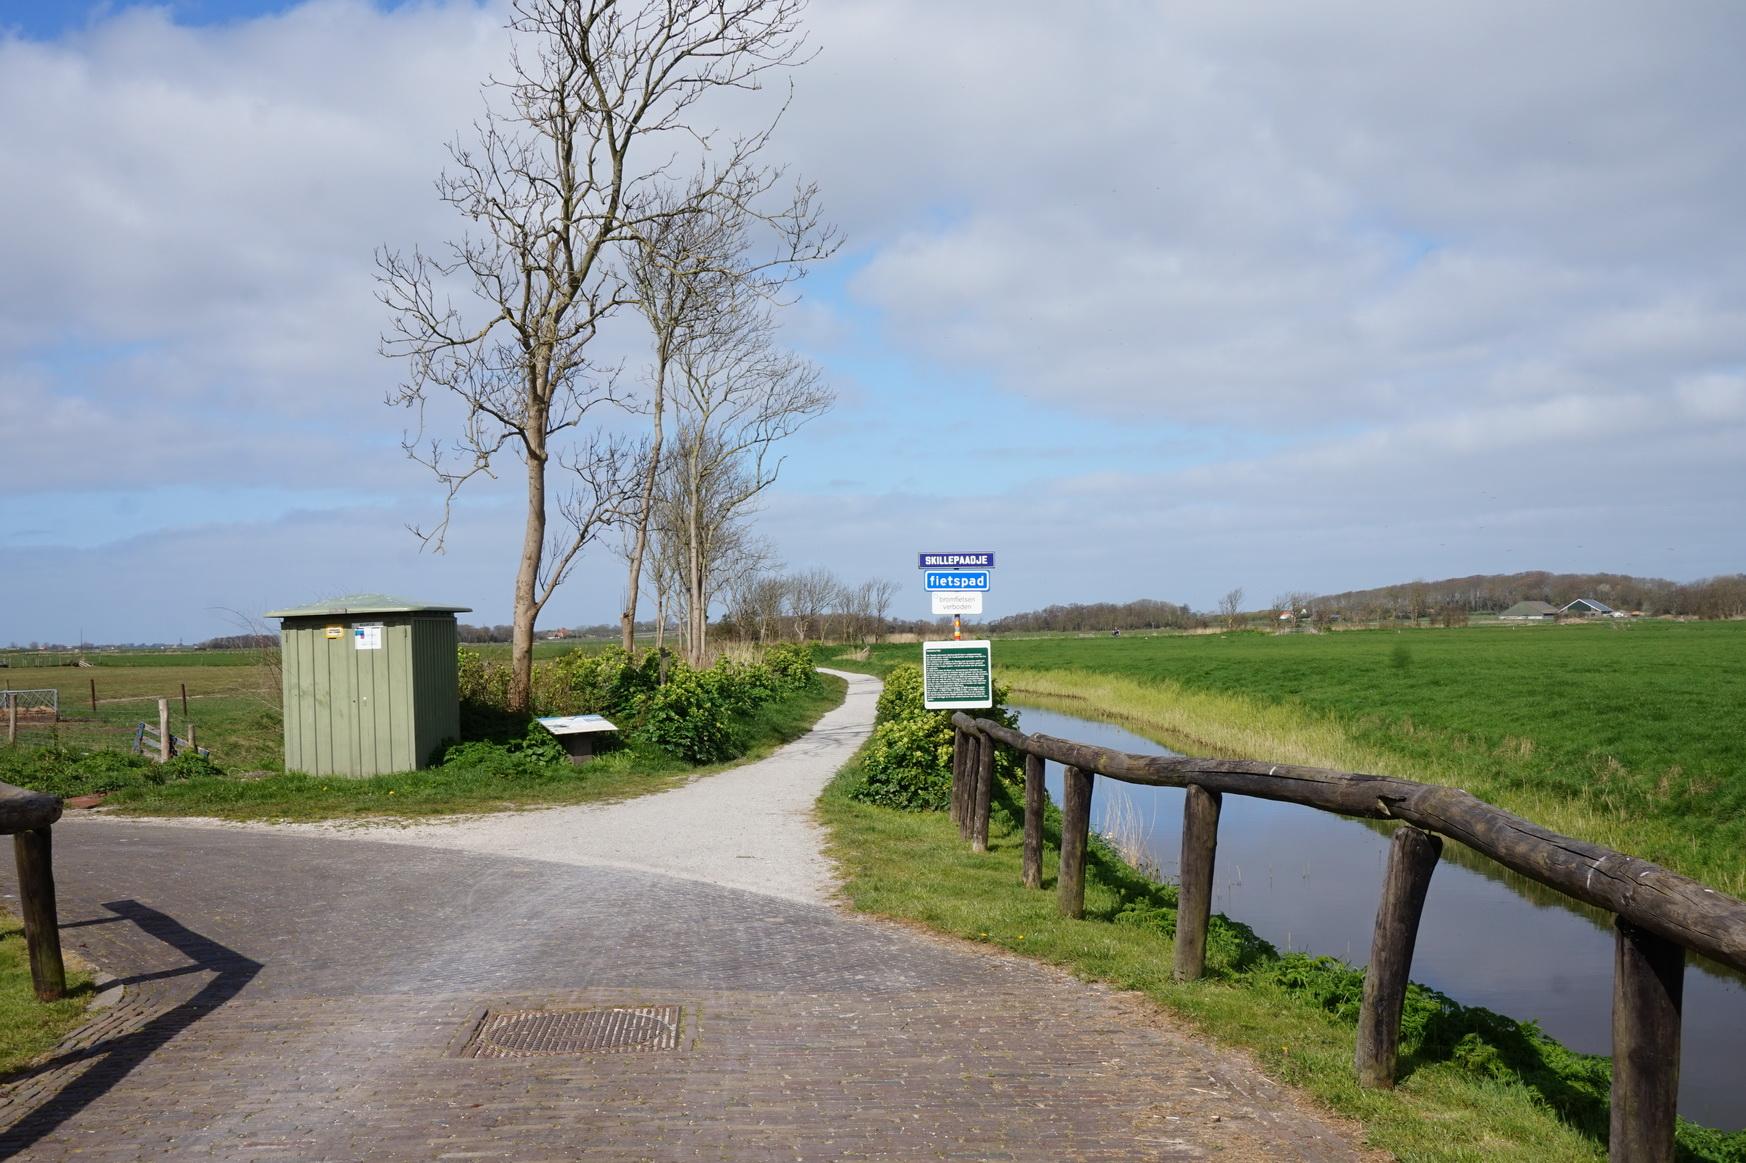 Texel - Wanderung VOC-Route 3